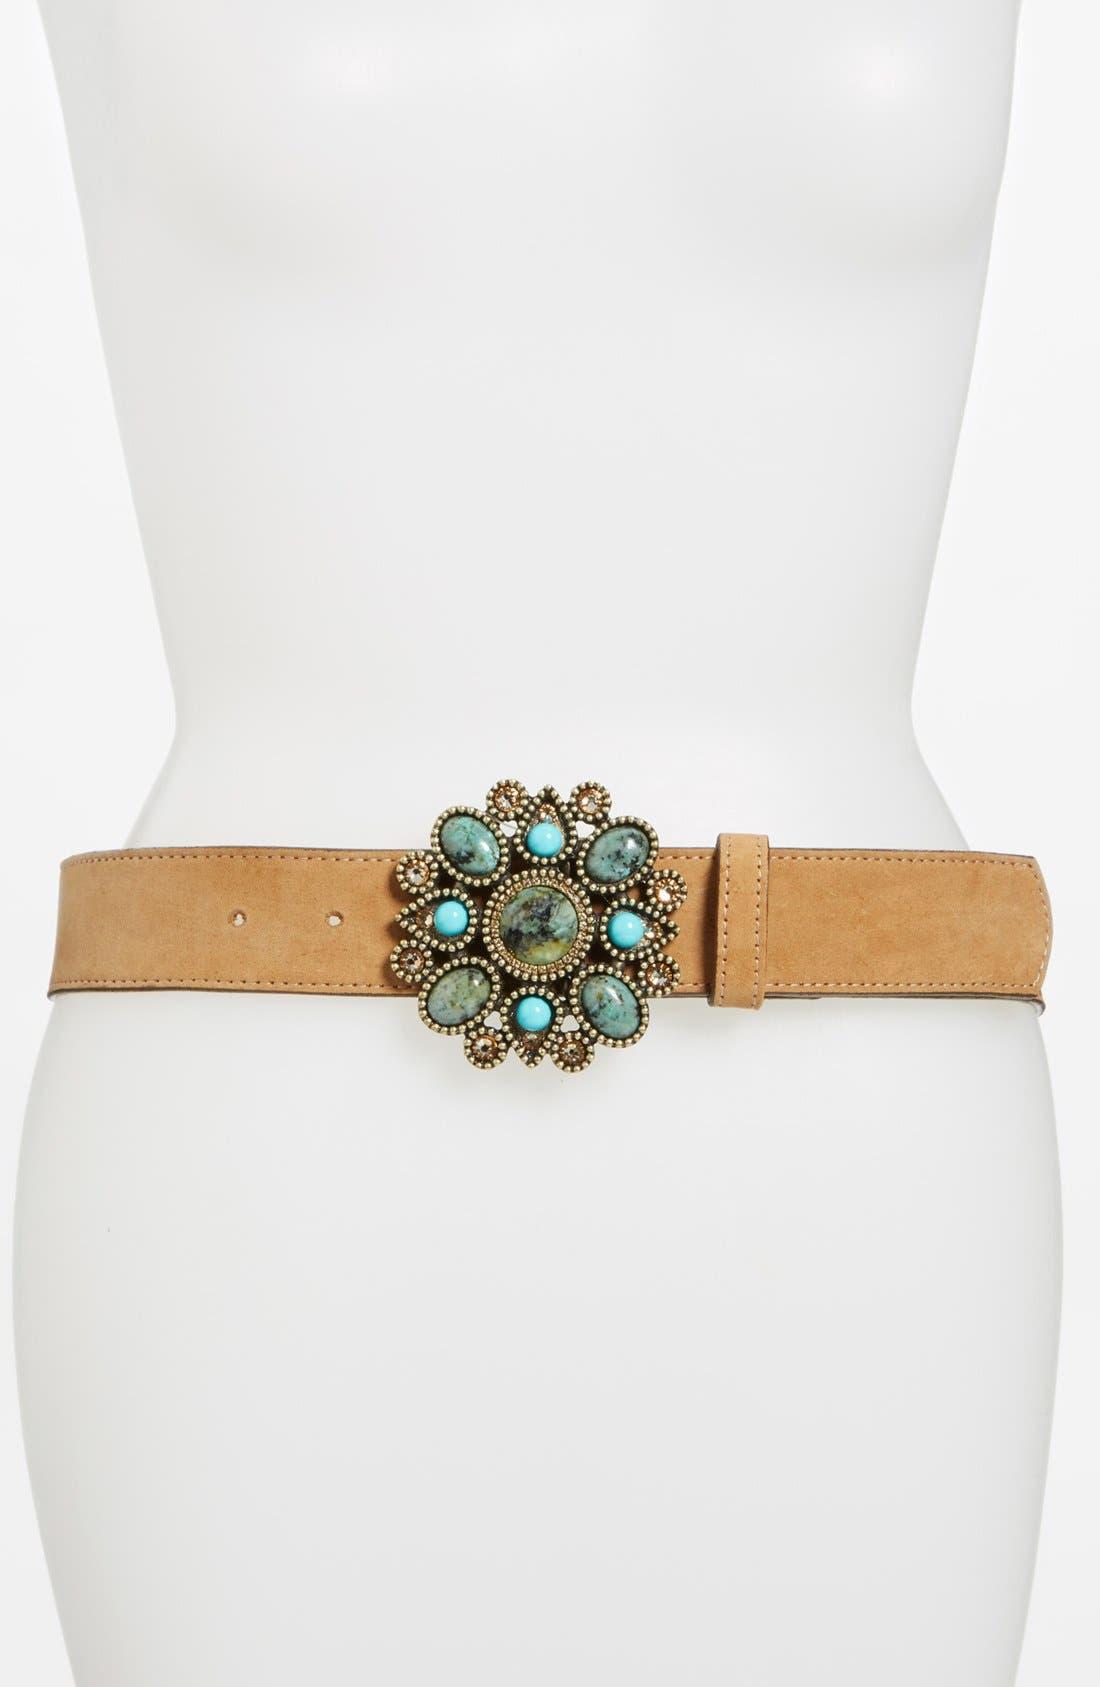 Main Image - Leatherock Turquoise Buckle Belt